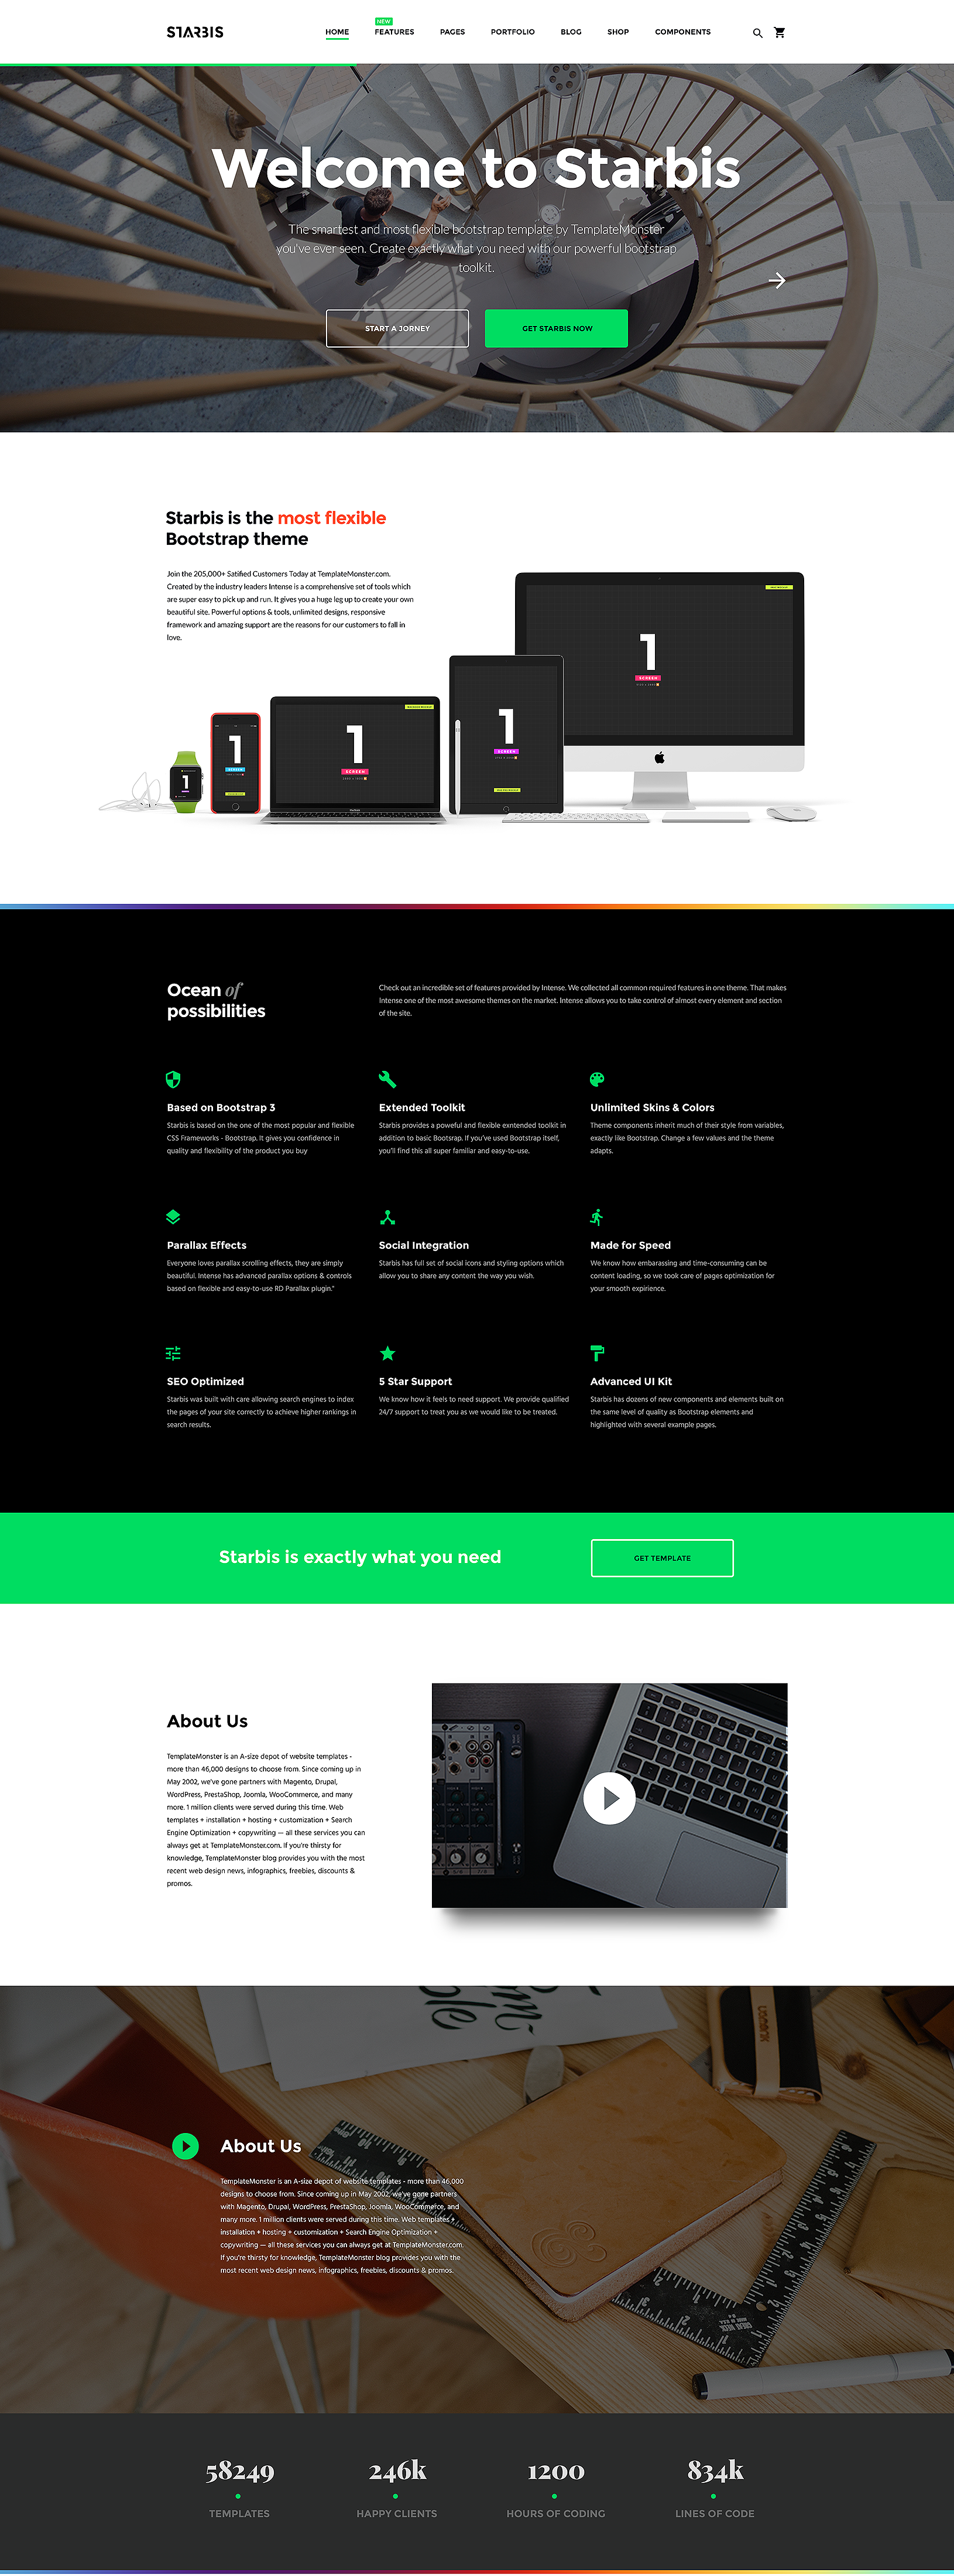 Upcoming Starbis Multipurpose HTML5 Template: Get It for a Special Price http://www.templatemonster.com/website-templates/starbis.html?utm_source=pinterest&utm_medium=tm&utm_campaign=starbispre